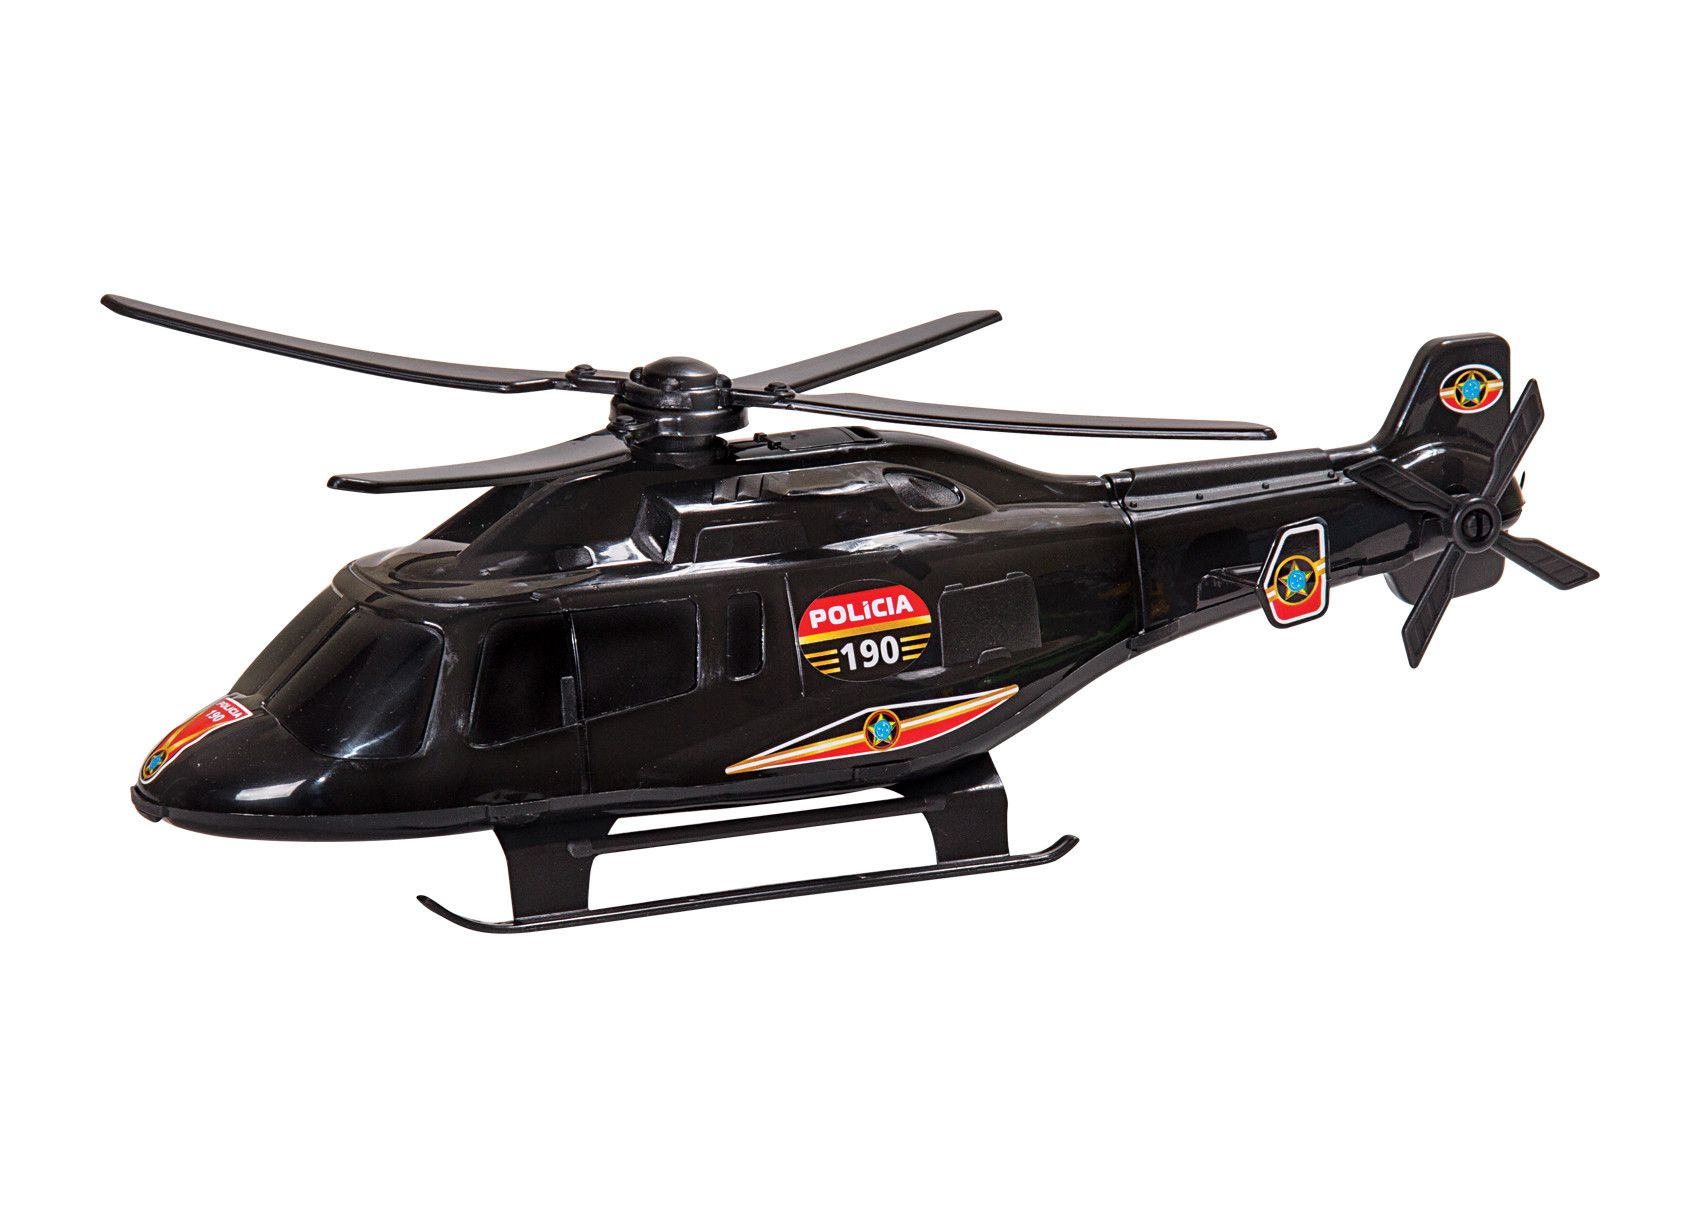 Helicoptero Mini Policia Resgate Bs Toys